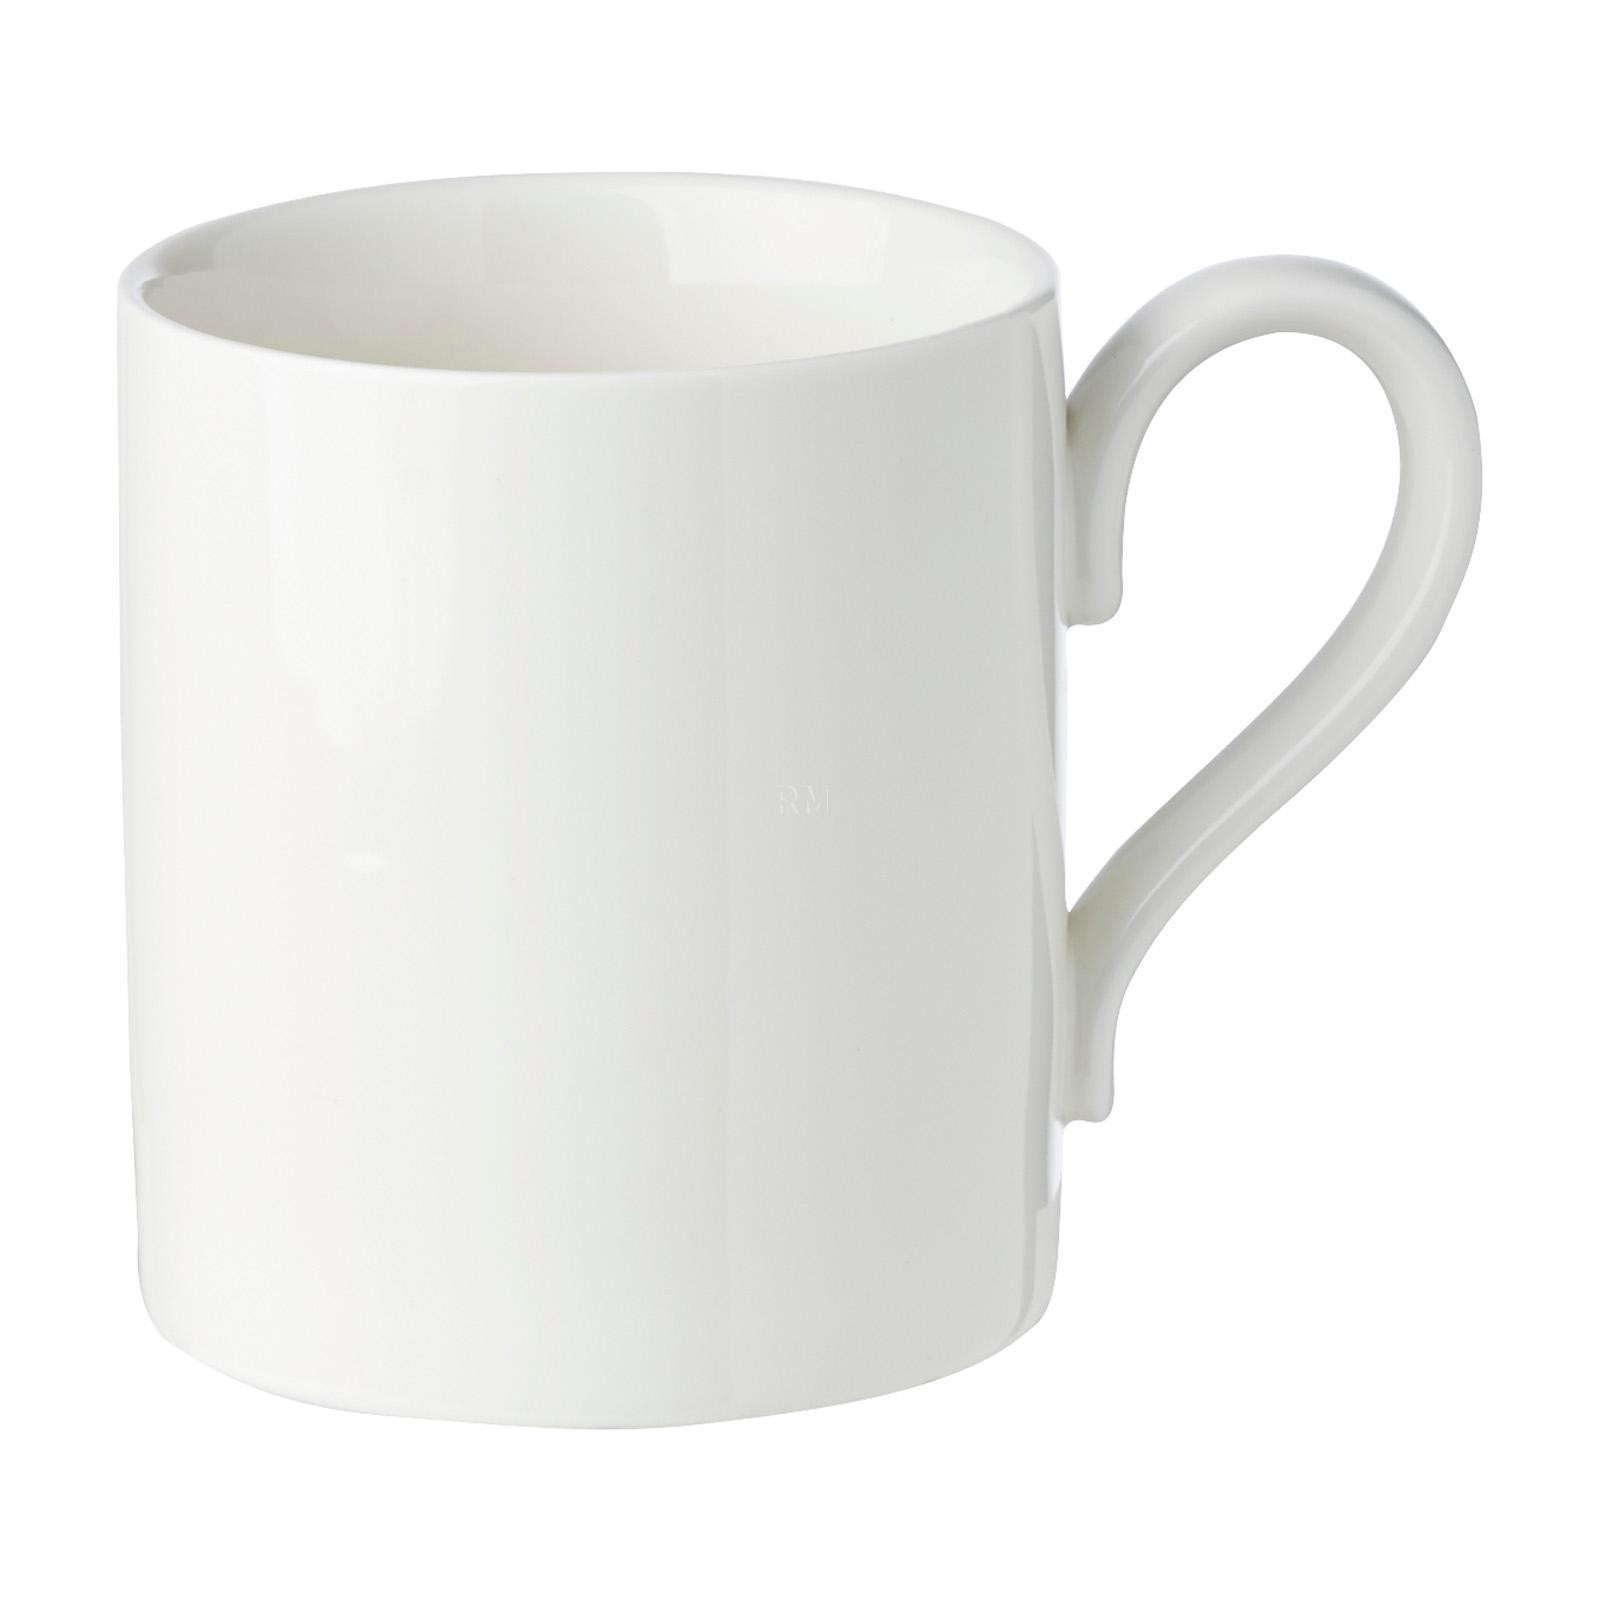 Wilmax England Porcelain Mug